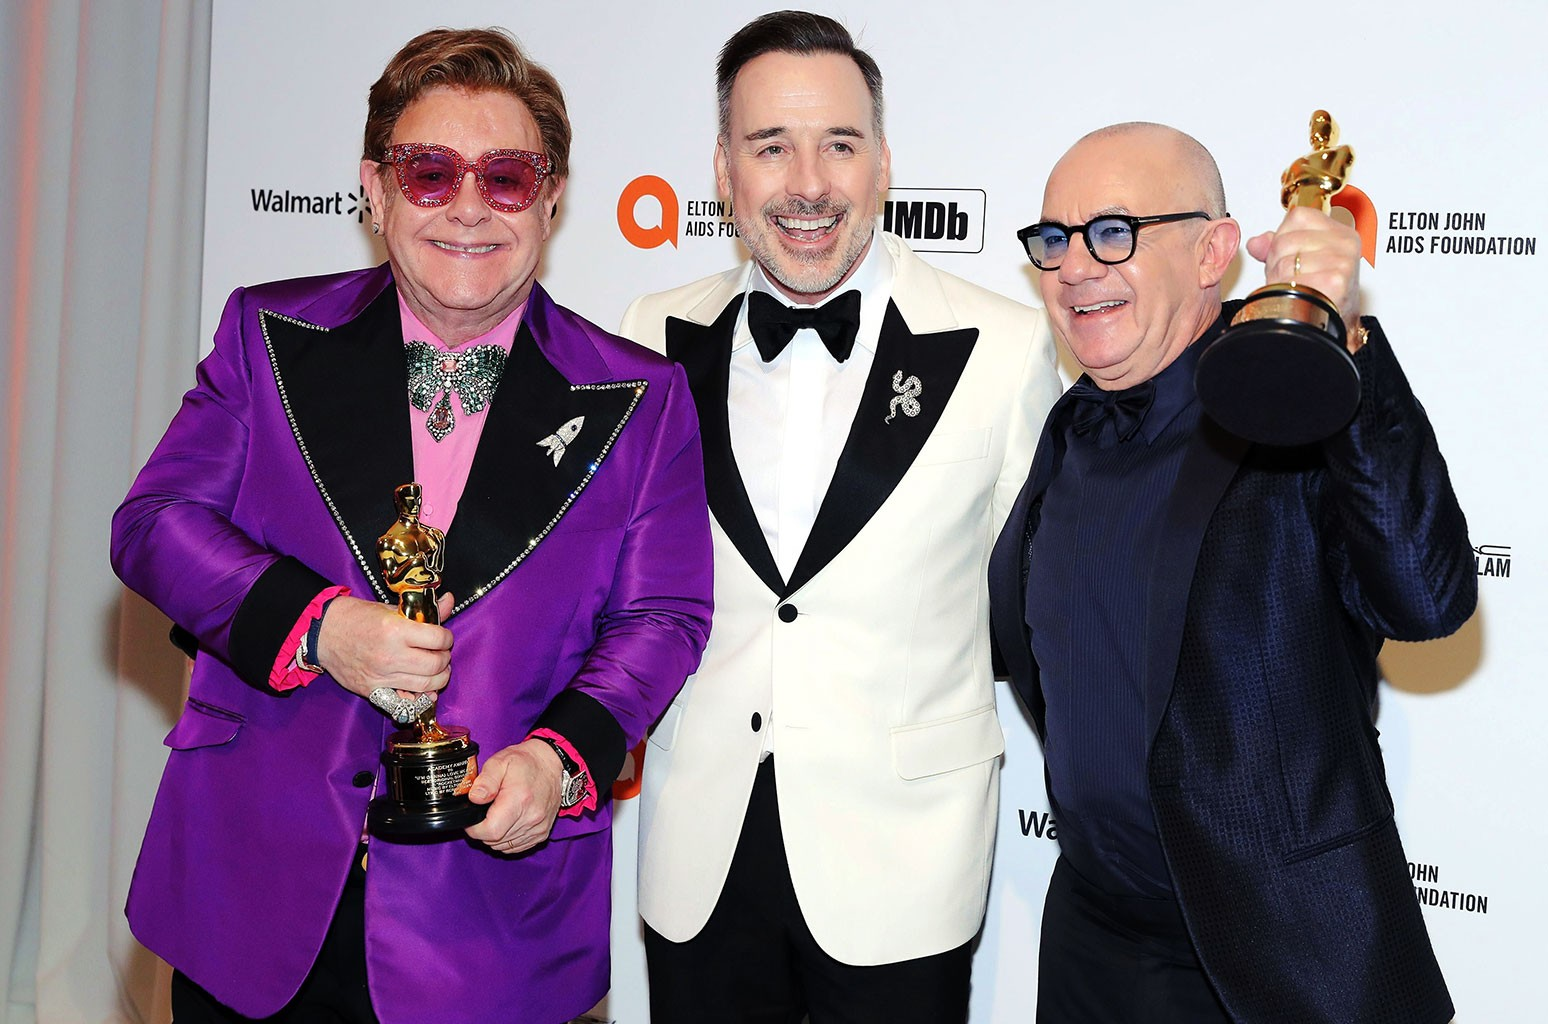 Sir Elton John, David Furnish and Bernie Taupin